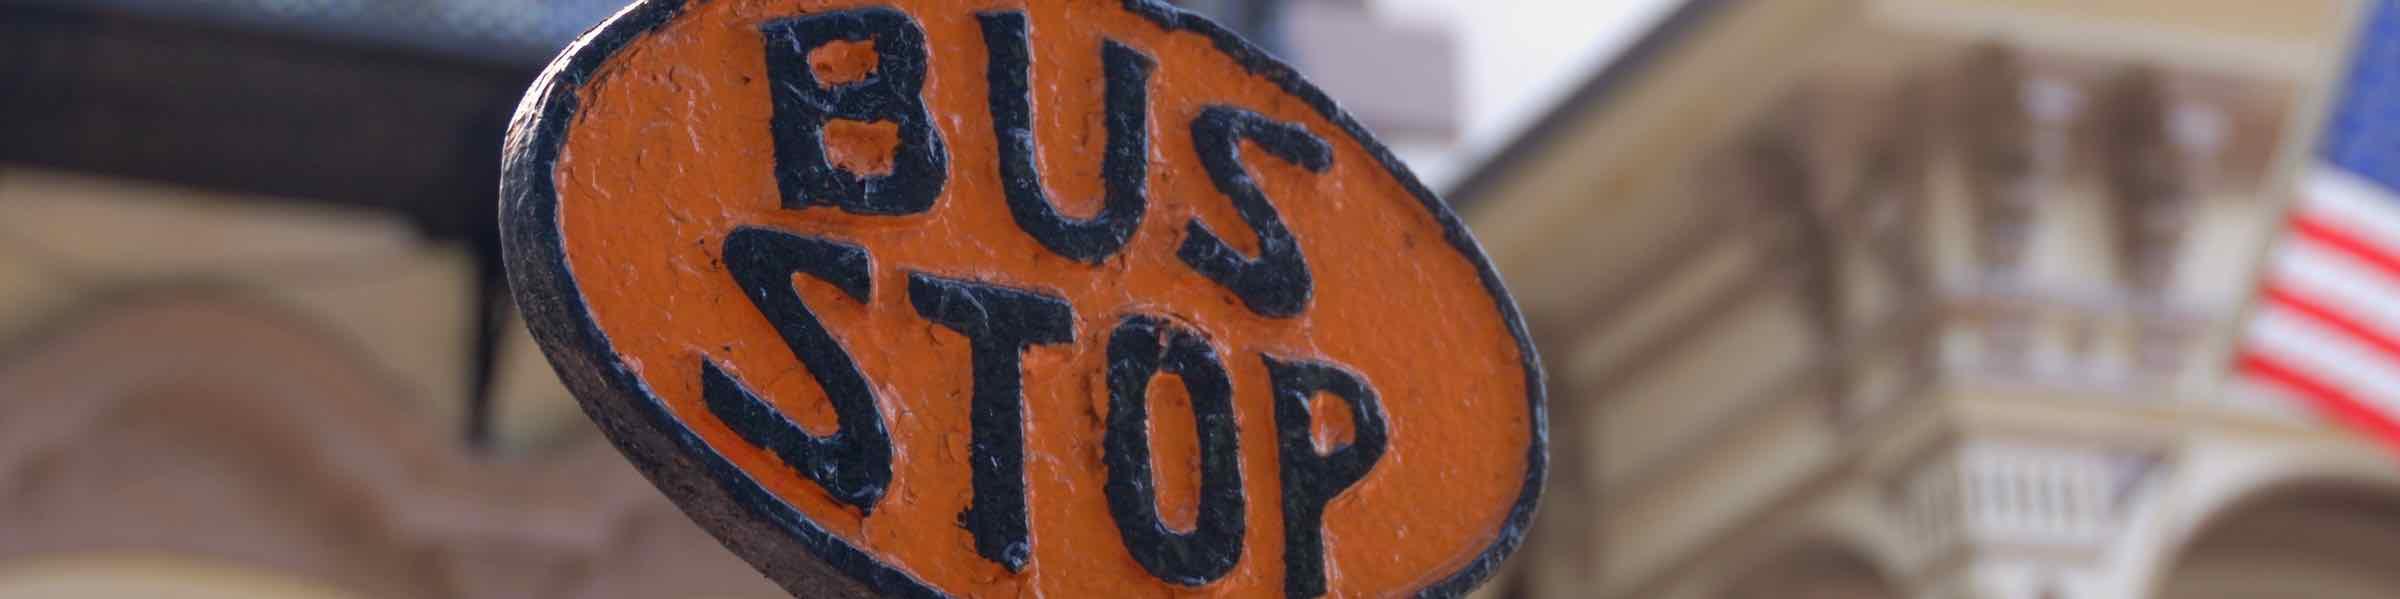 public transport in savannah, ga